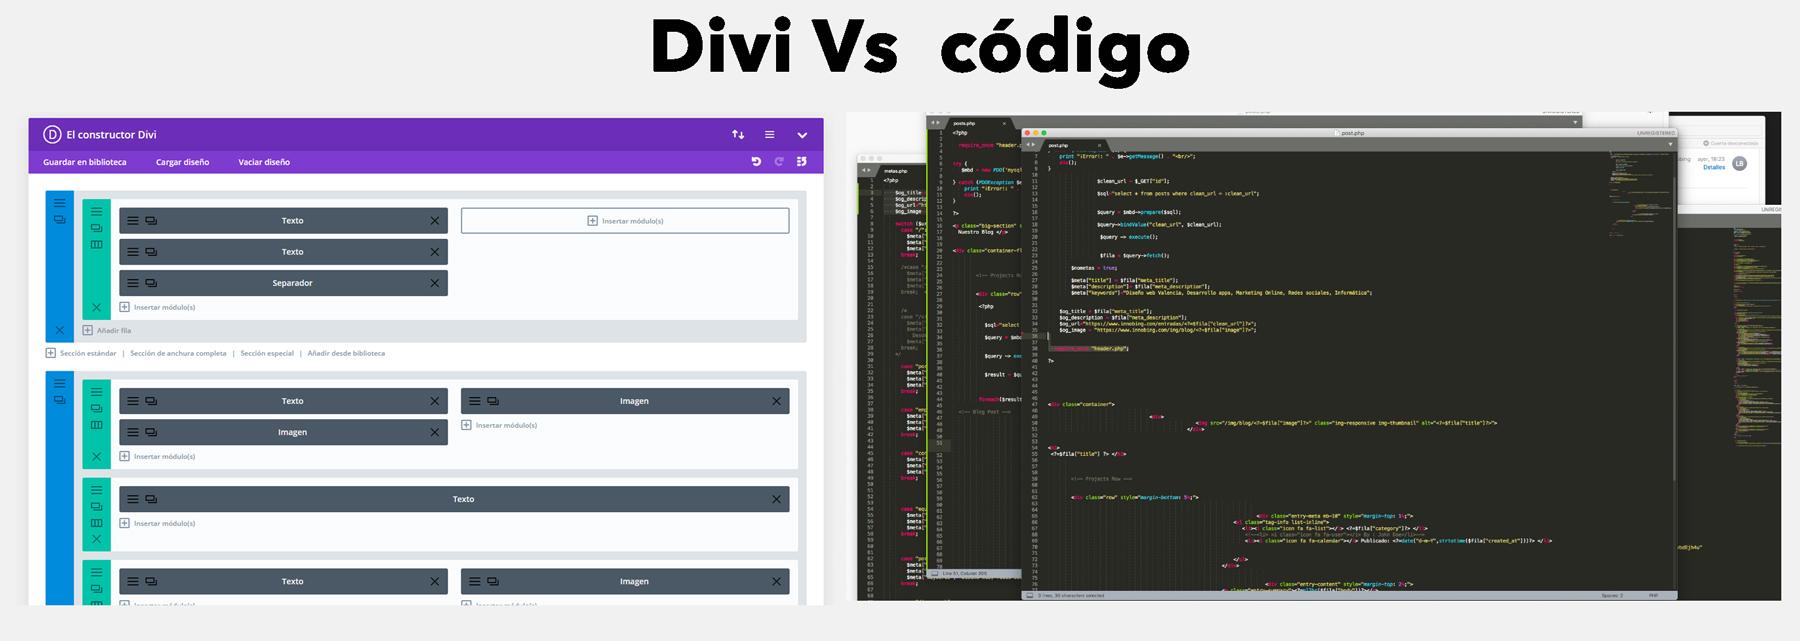 Divi vs. Código